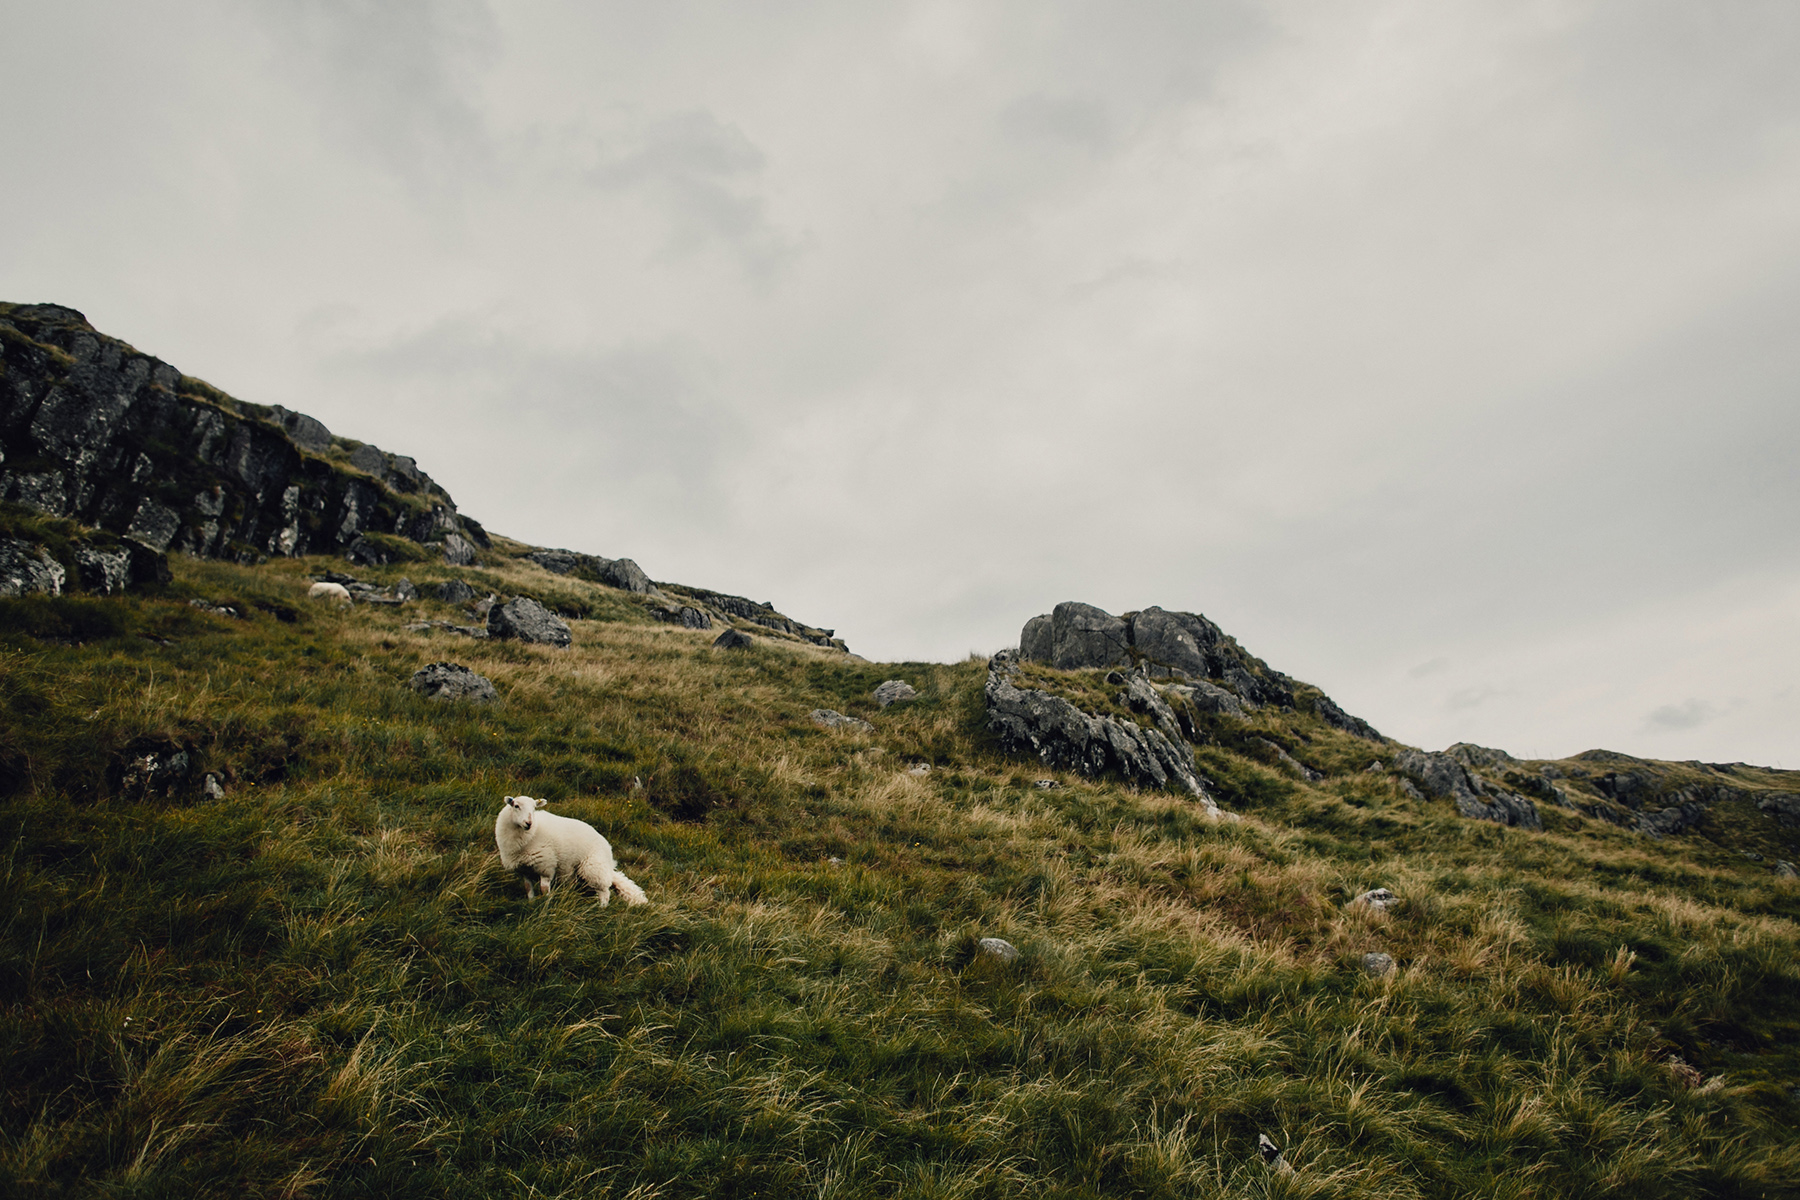 Mt-Snowdon-Hike-Photos-From-Peny-Pass-00211.jpg